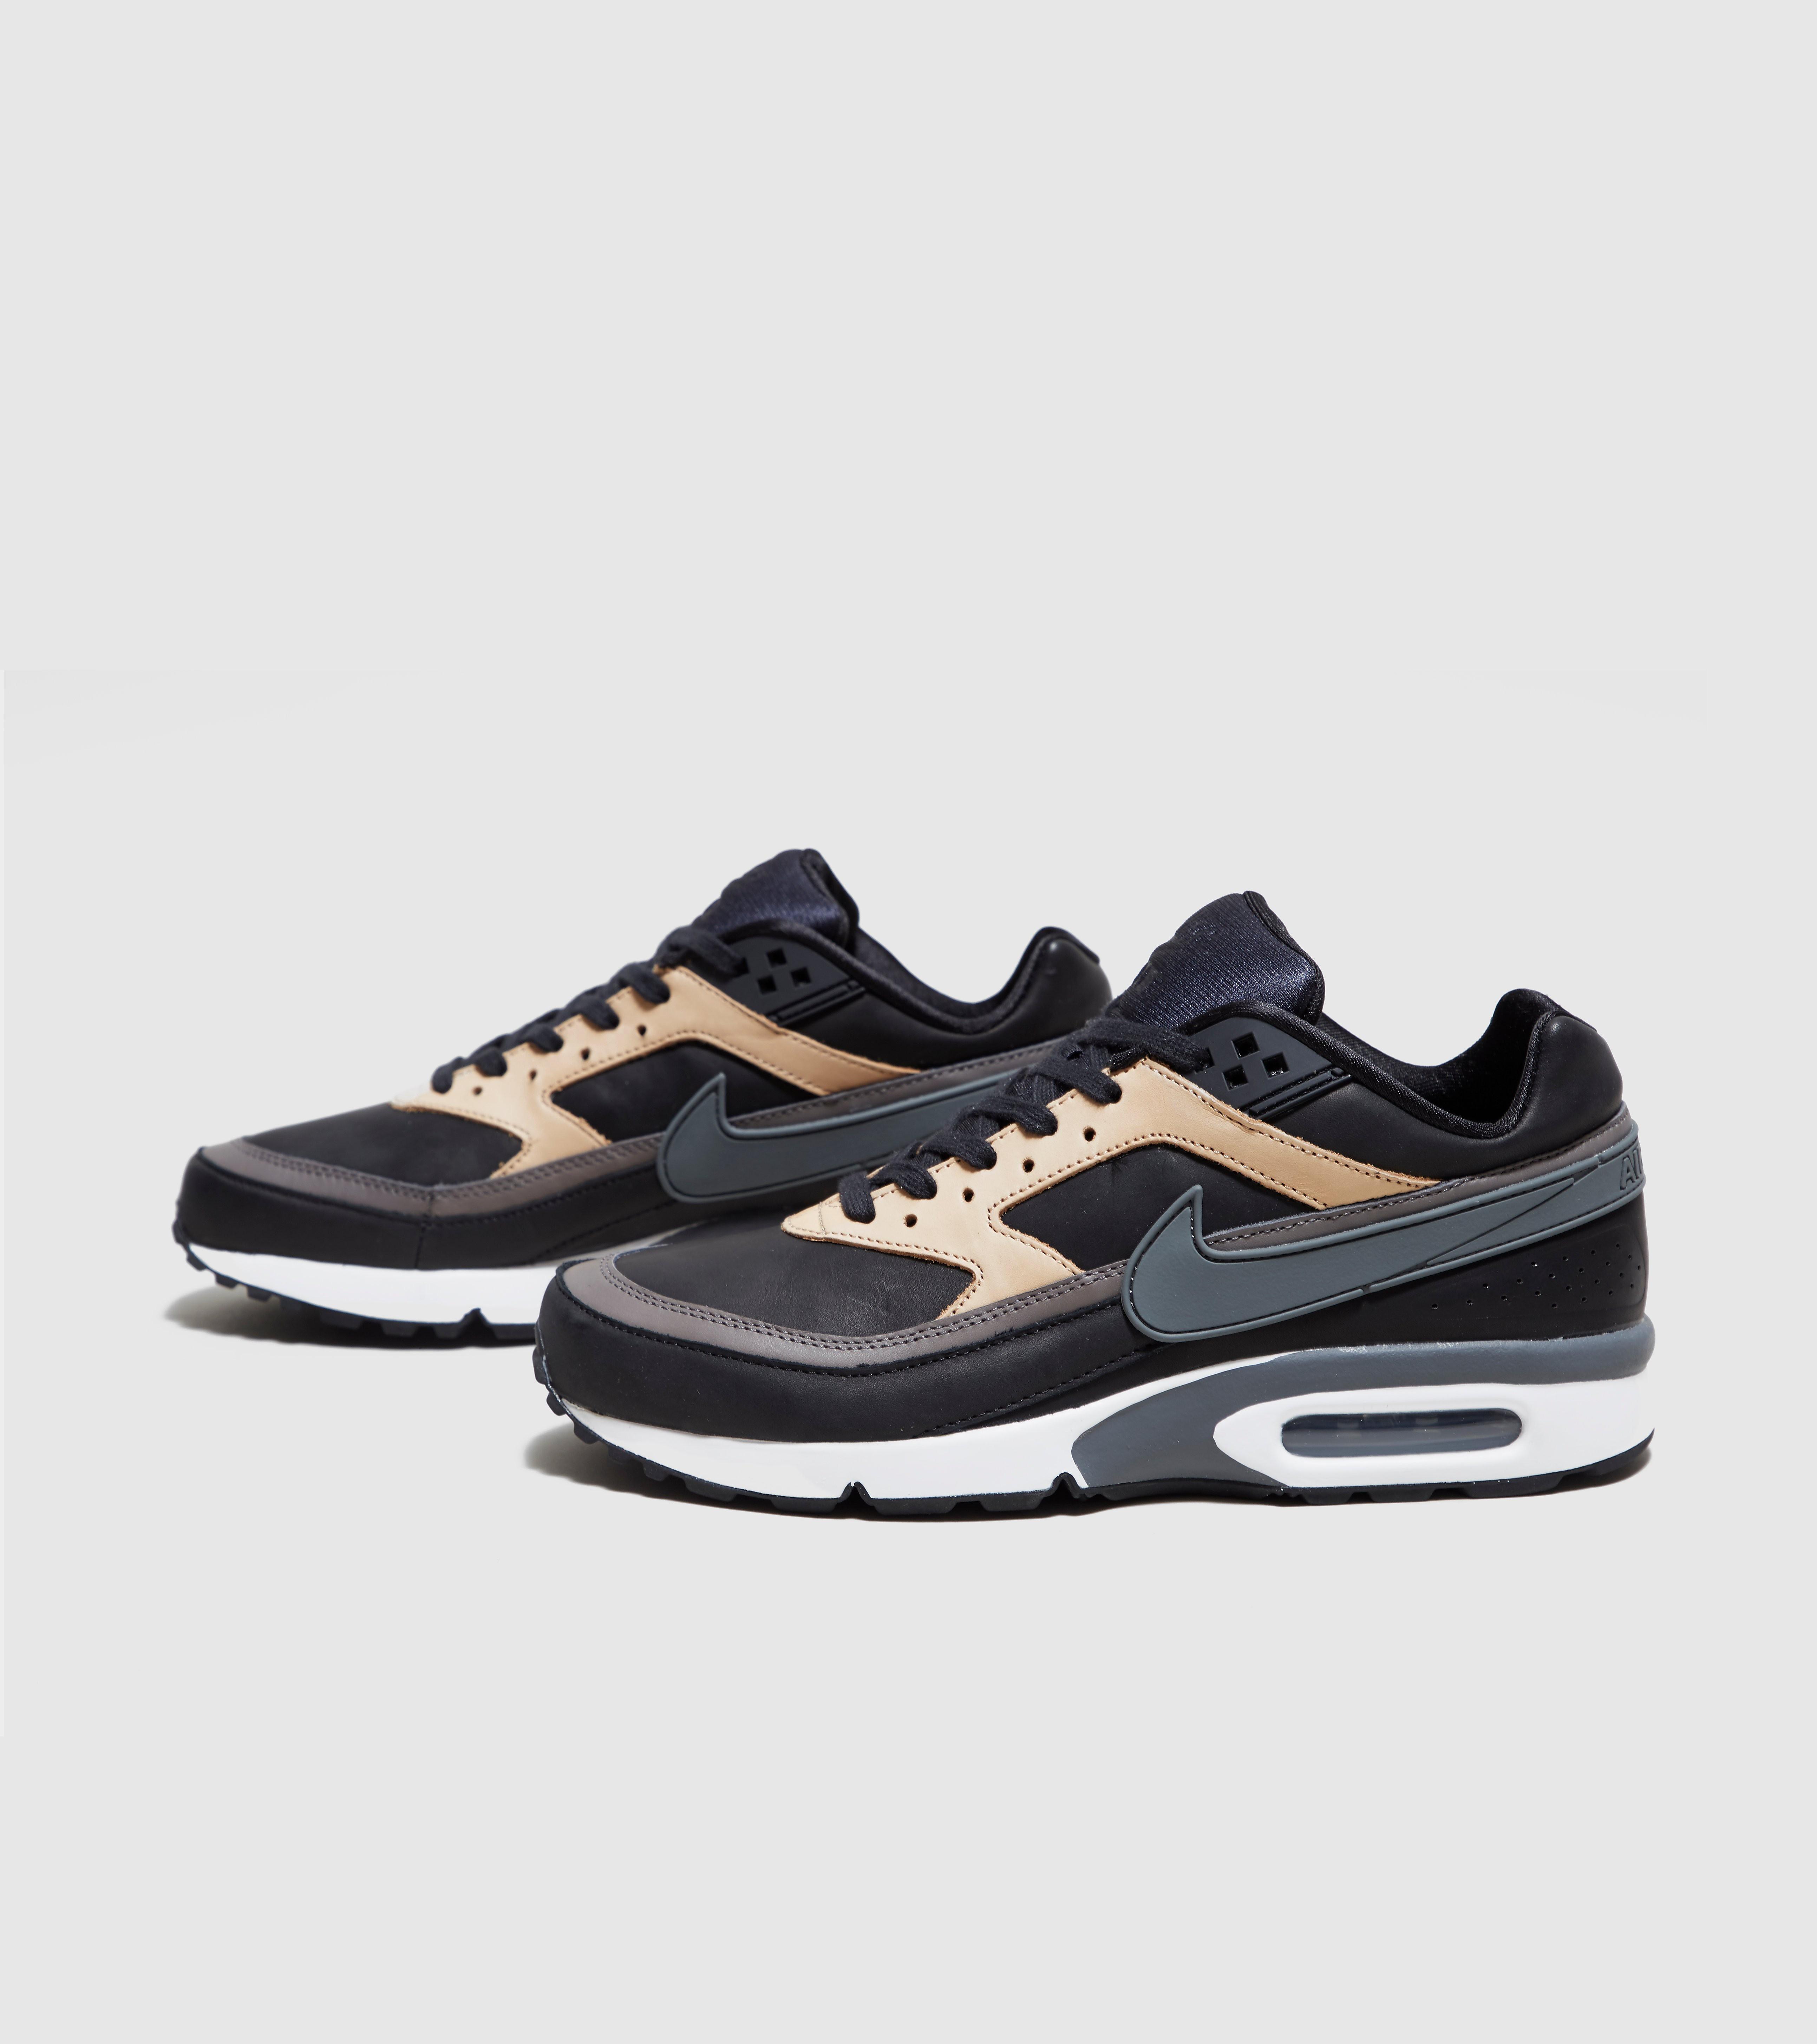 Nike Air Max BW Premium